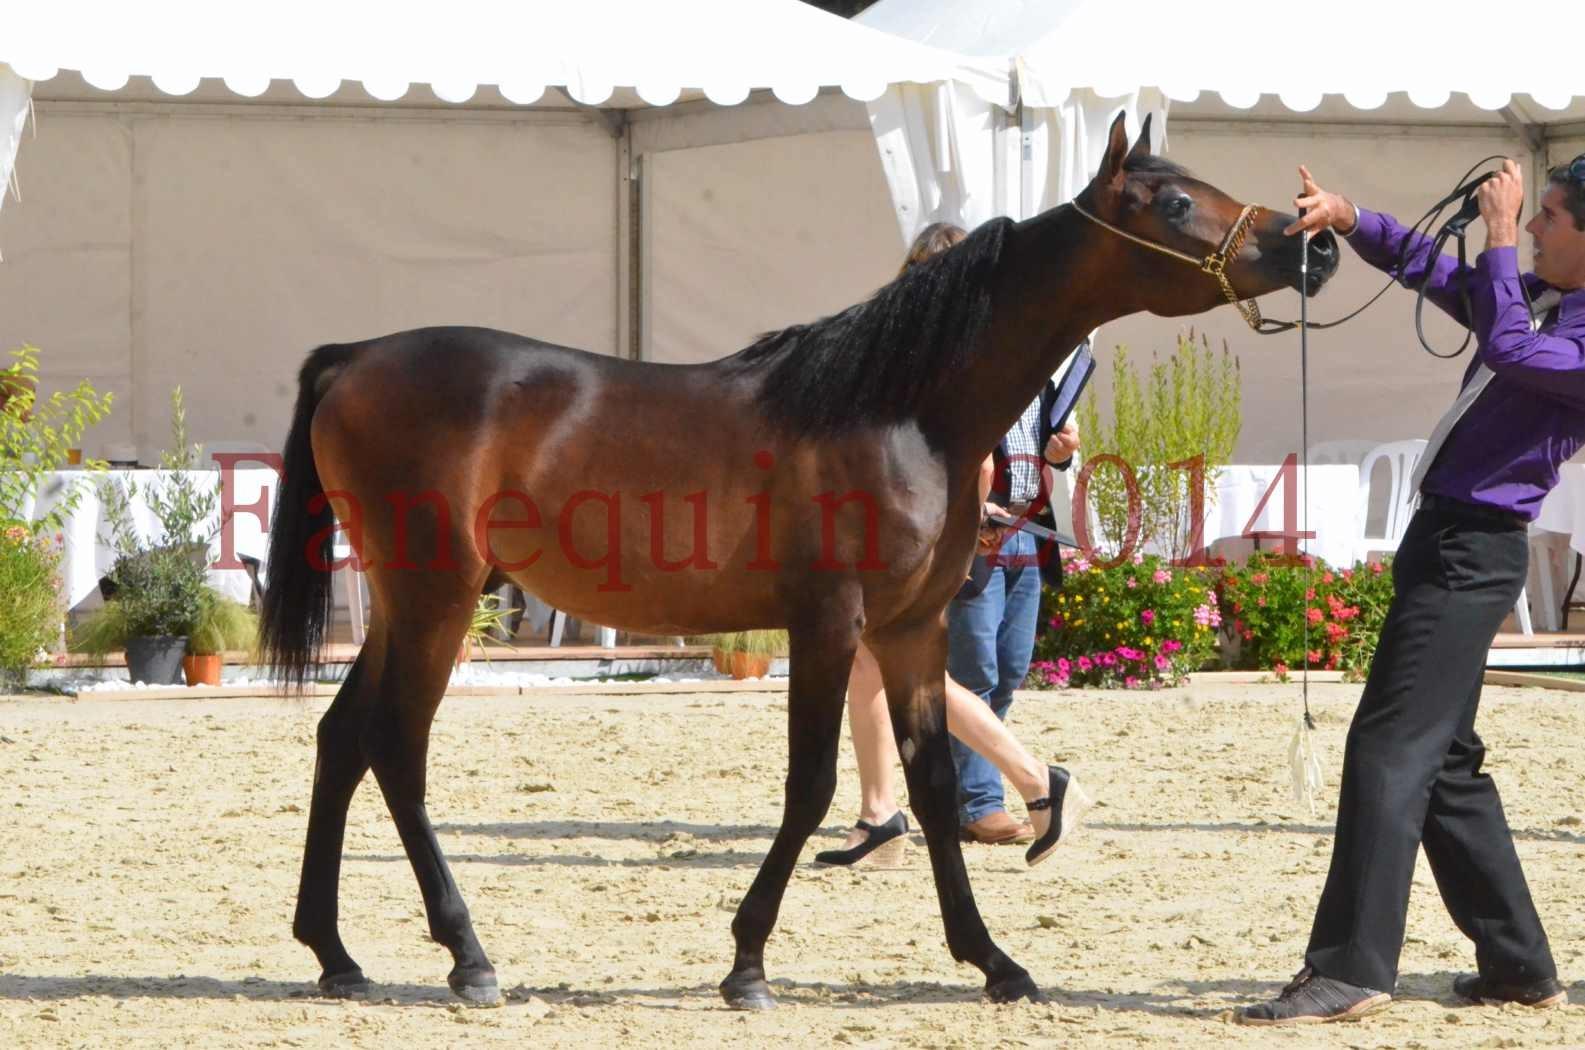 Championnat de FRANCE 2014 - Amateurs - SH FARAJAA - 41